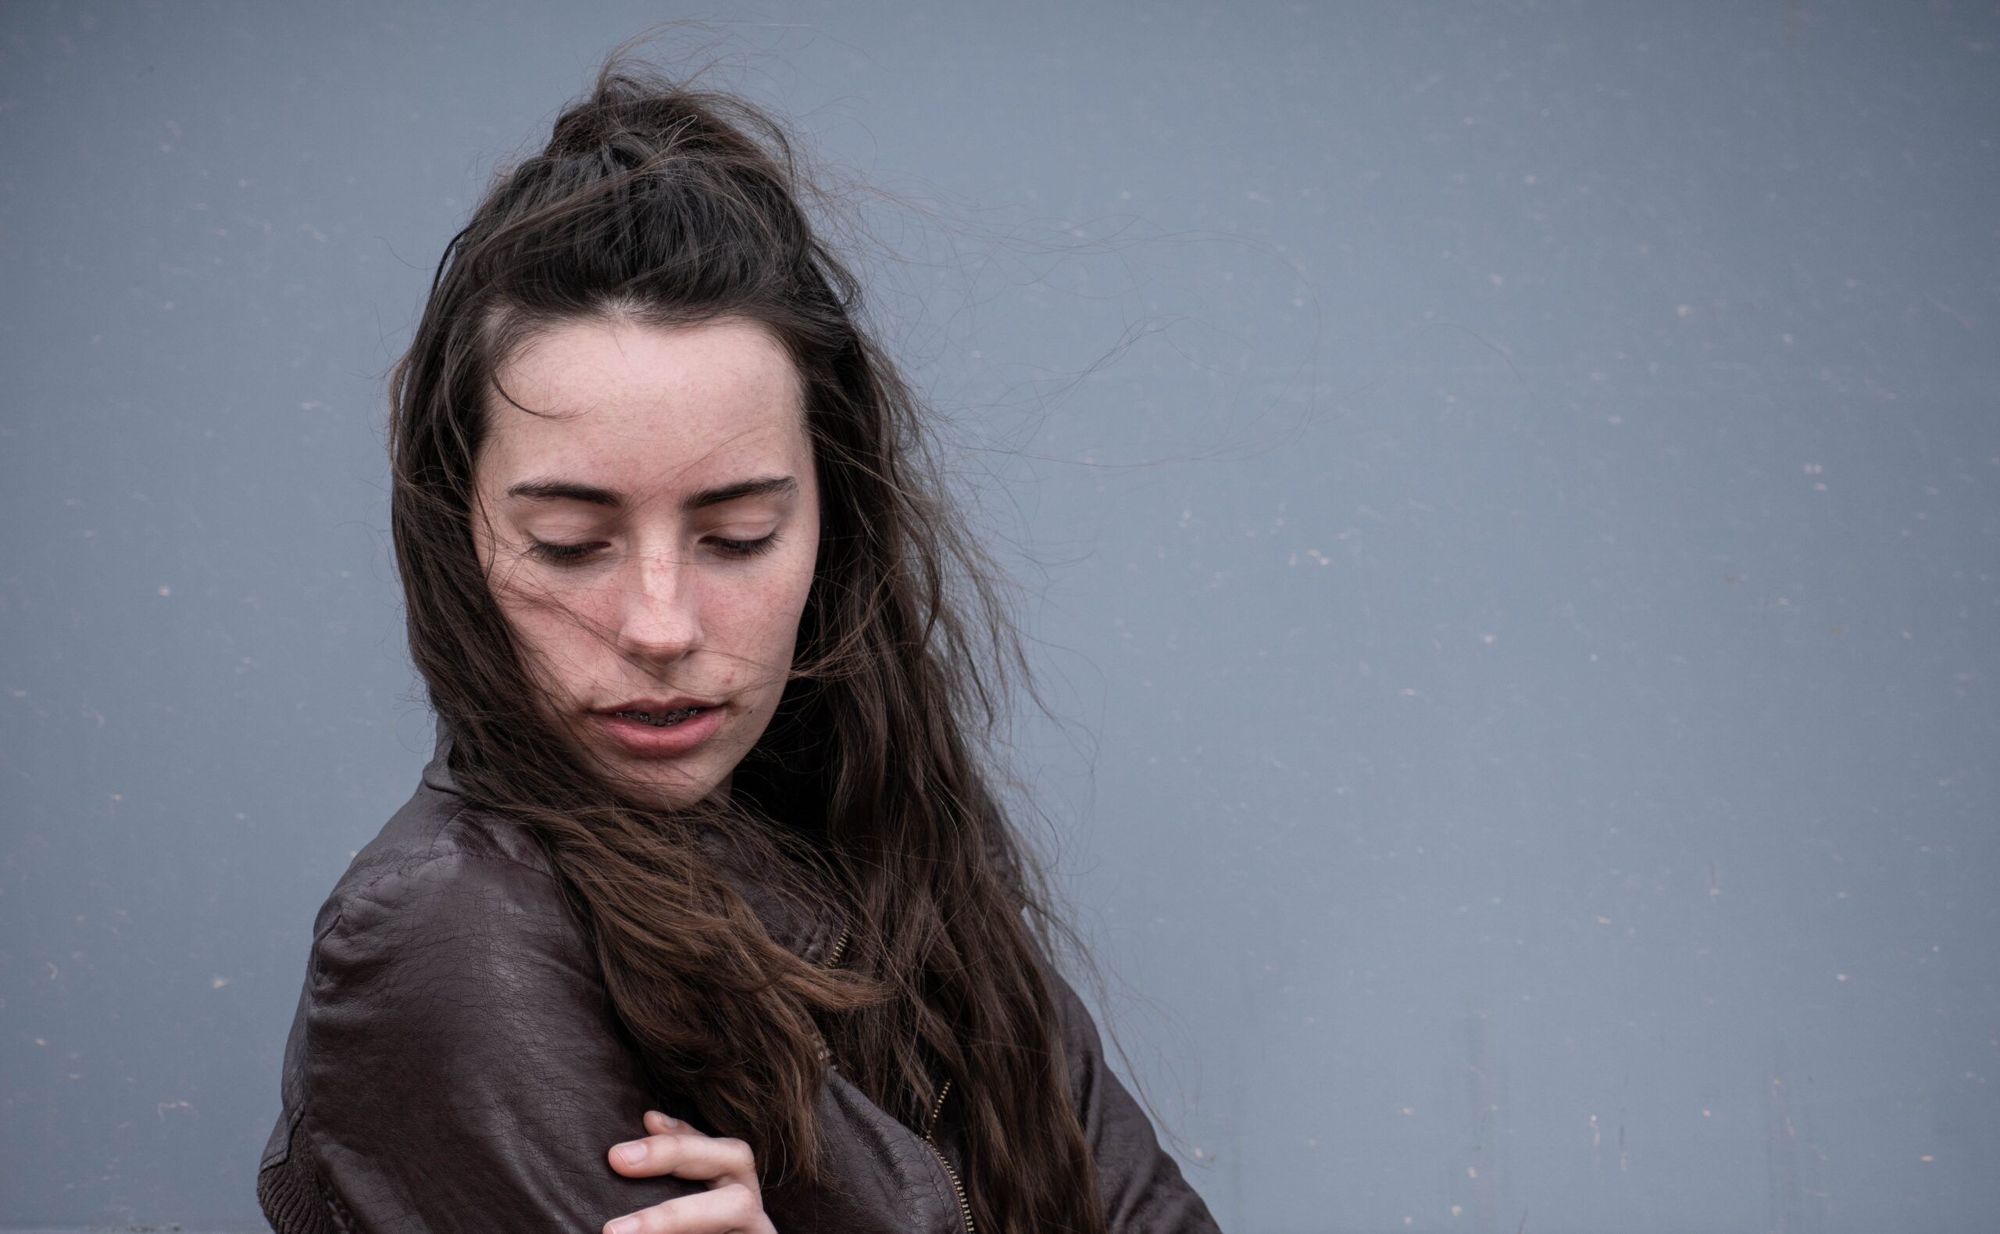 Misbrugsbehandling-socialangst-undgaelsesadfærd-vivi-hinrichs-psykologipsykiatri